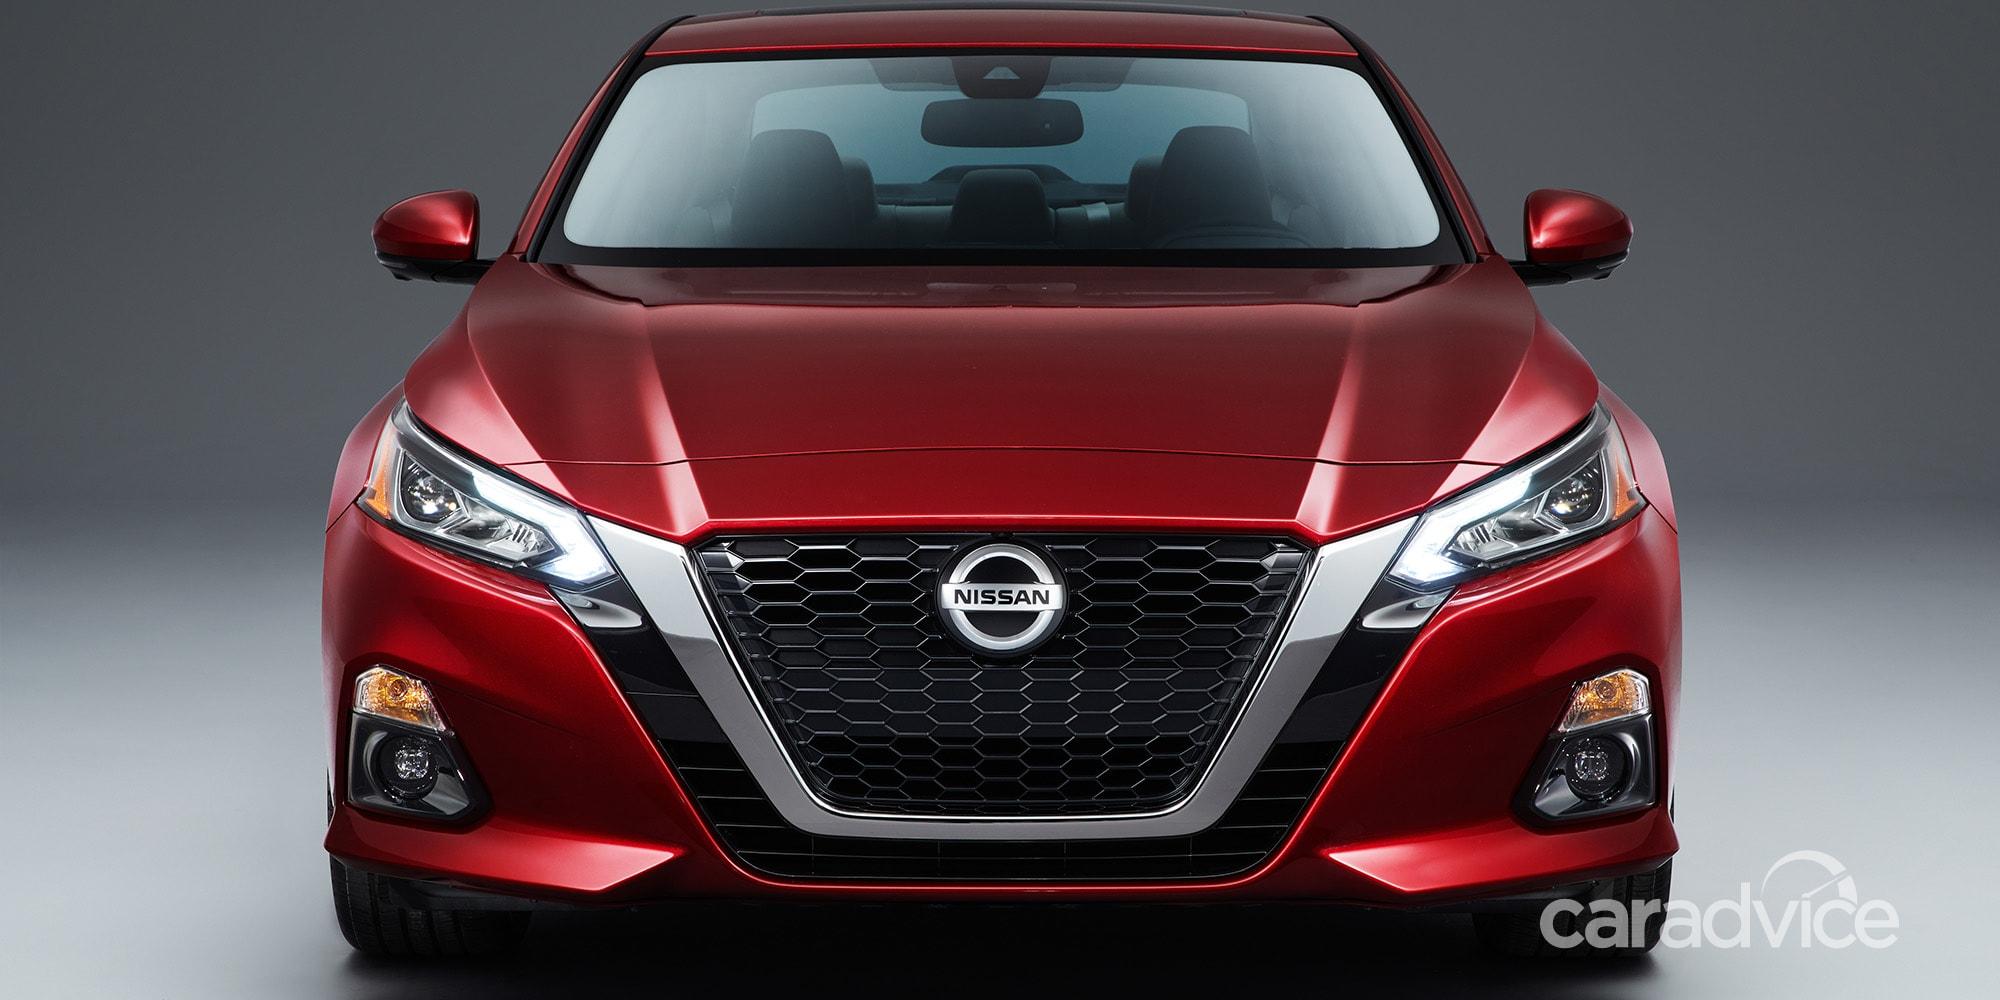 2019 Nissan Altima revealed - UPDATE | CarAdvice